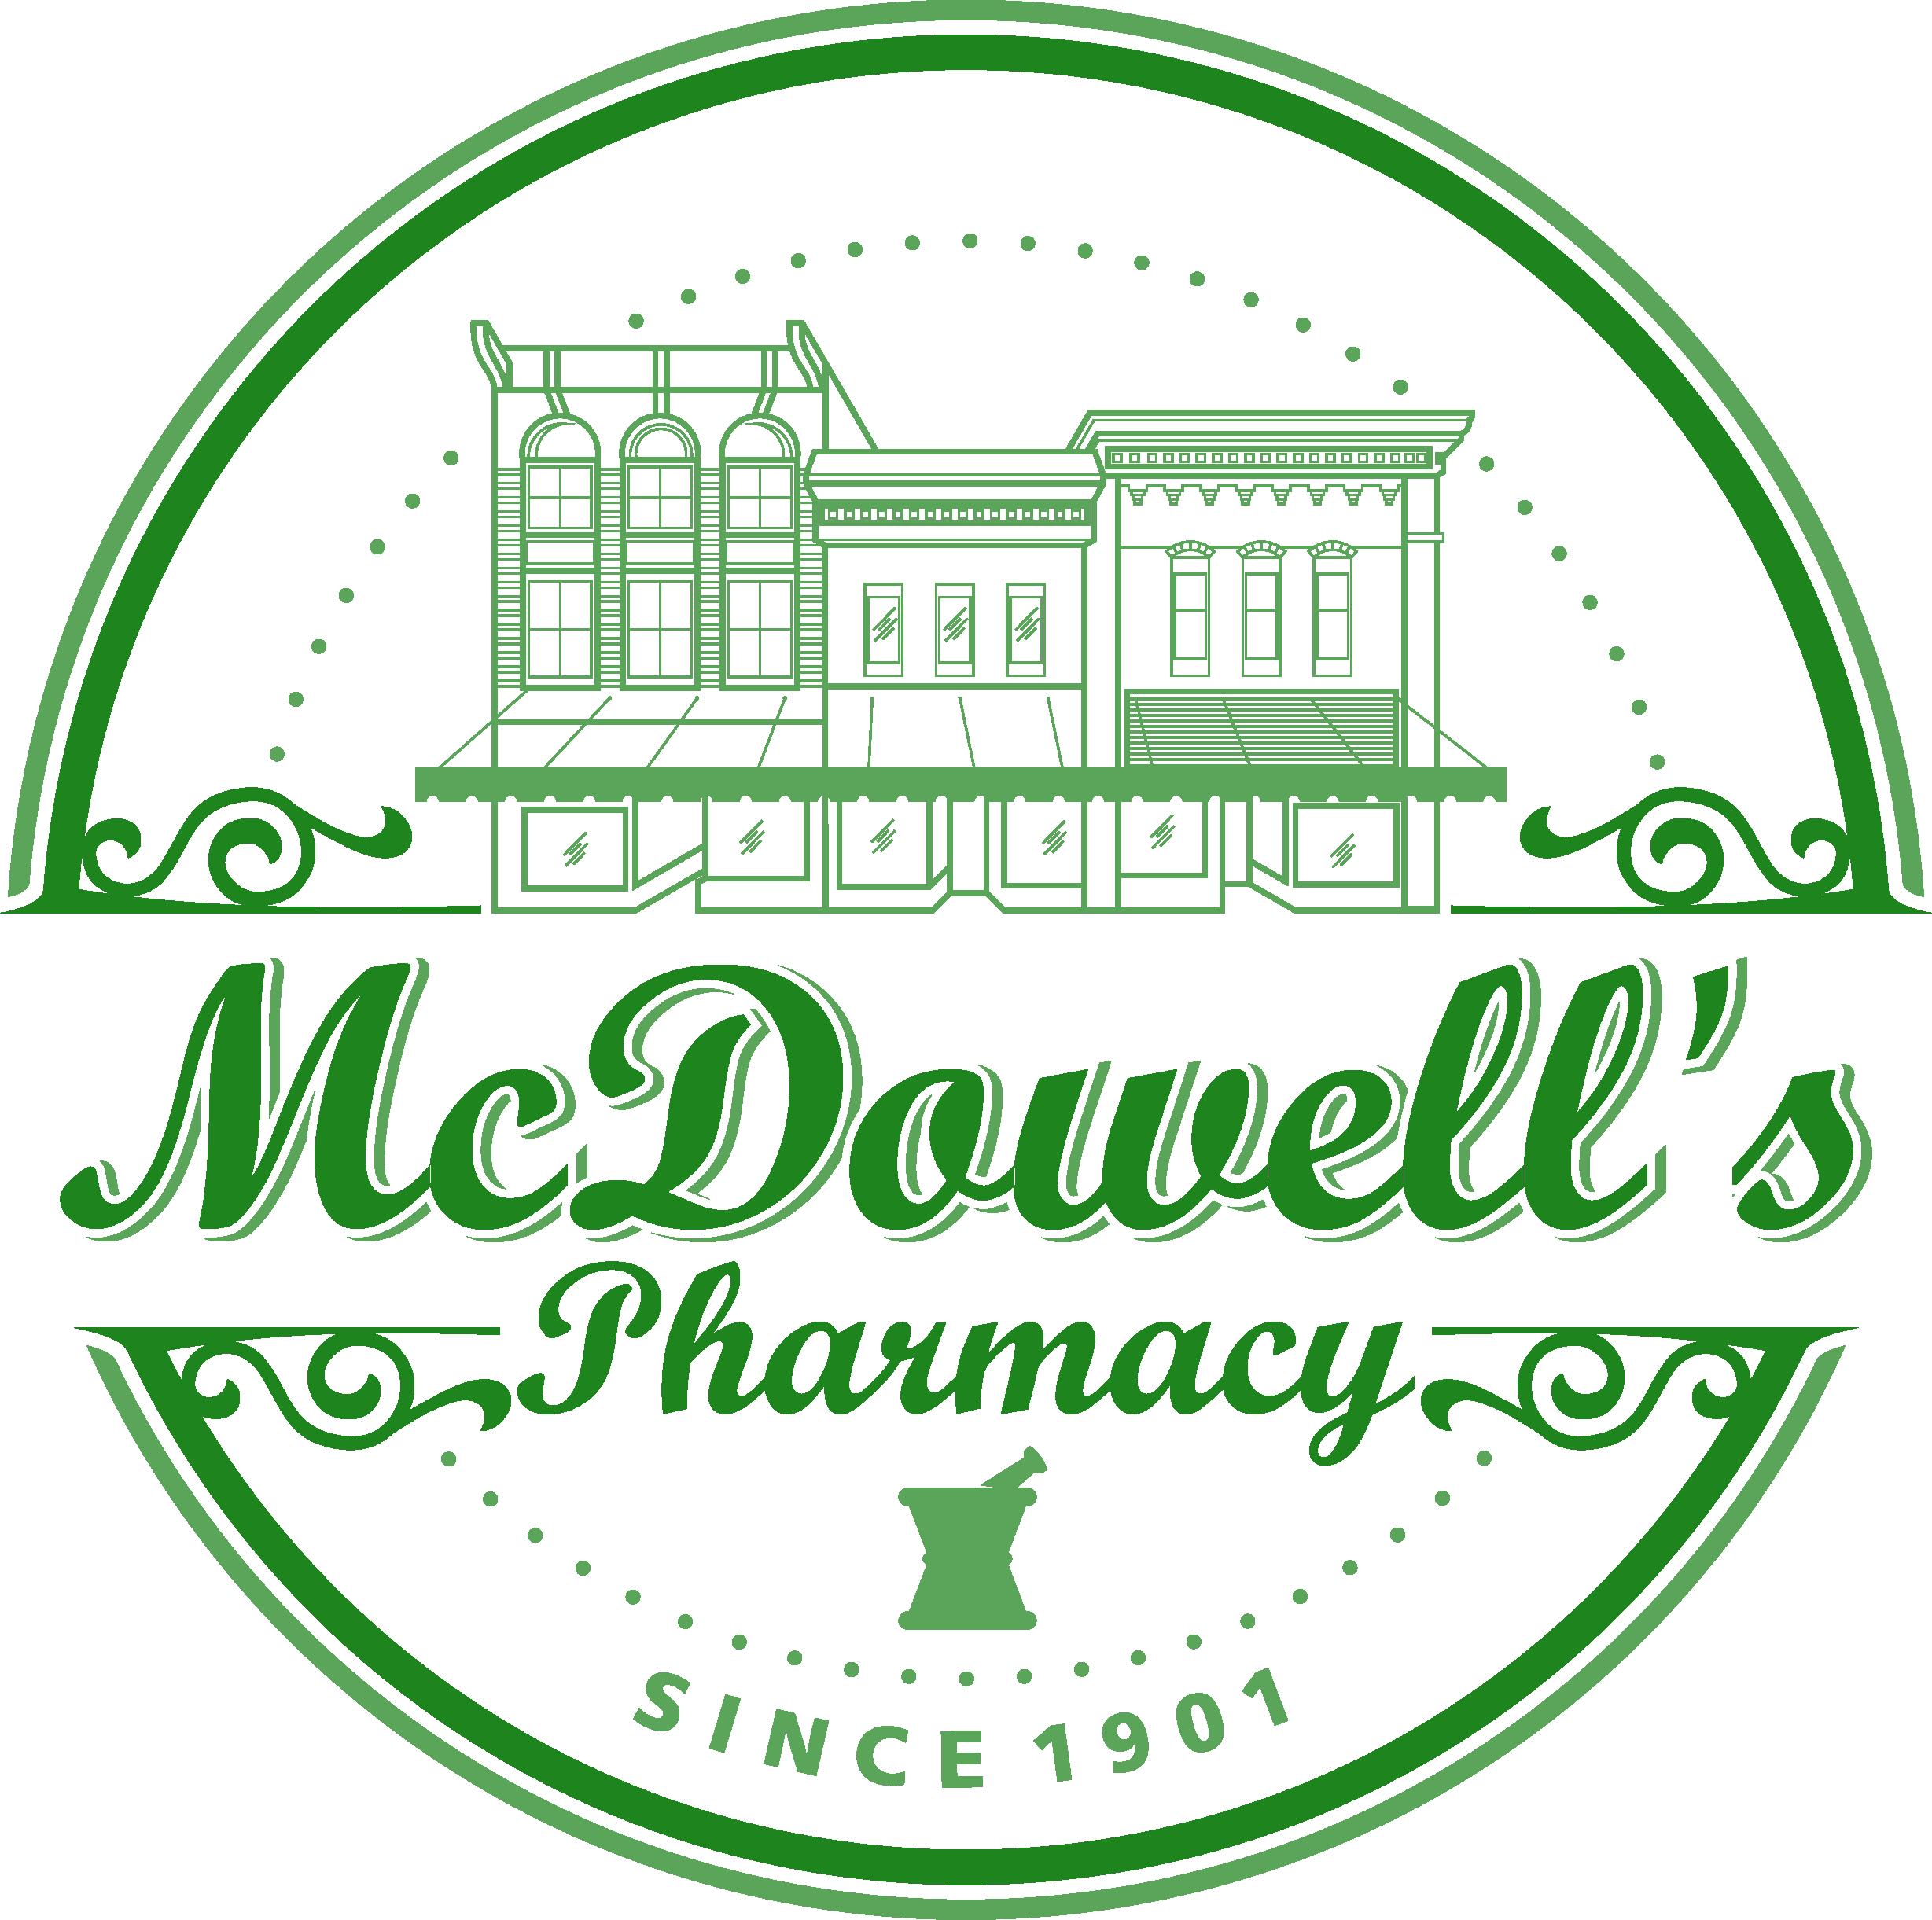 McDowell's Pharmacy